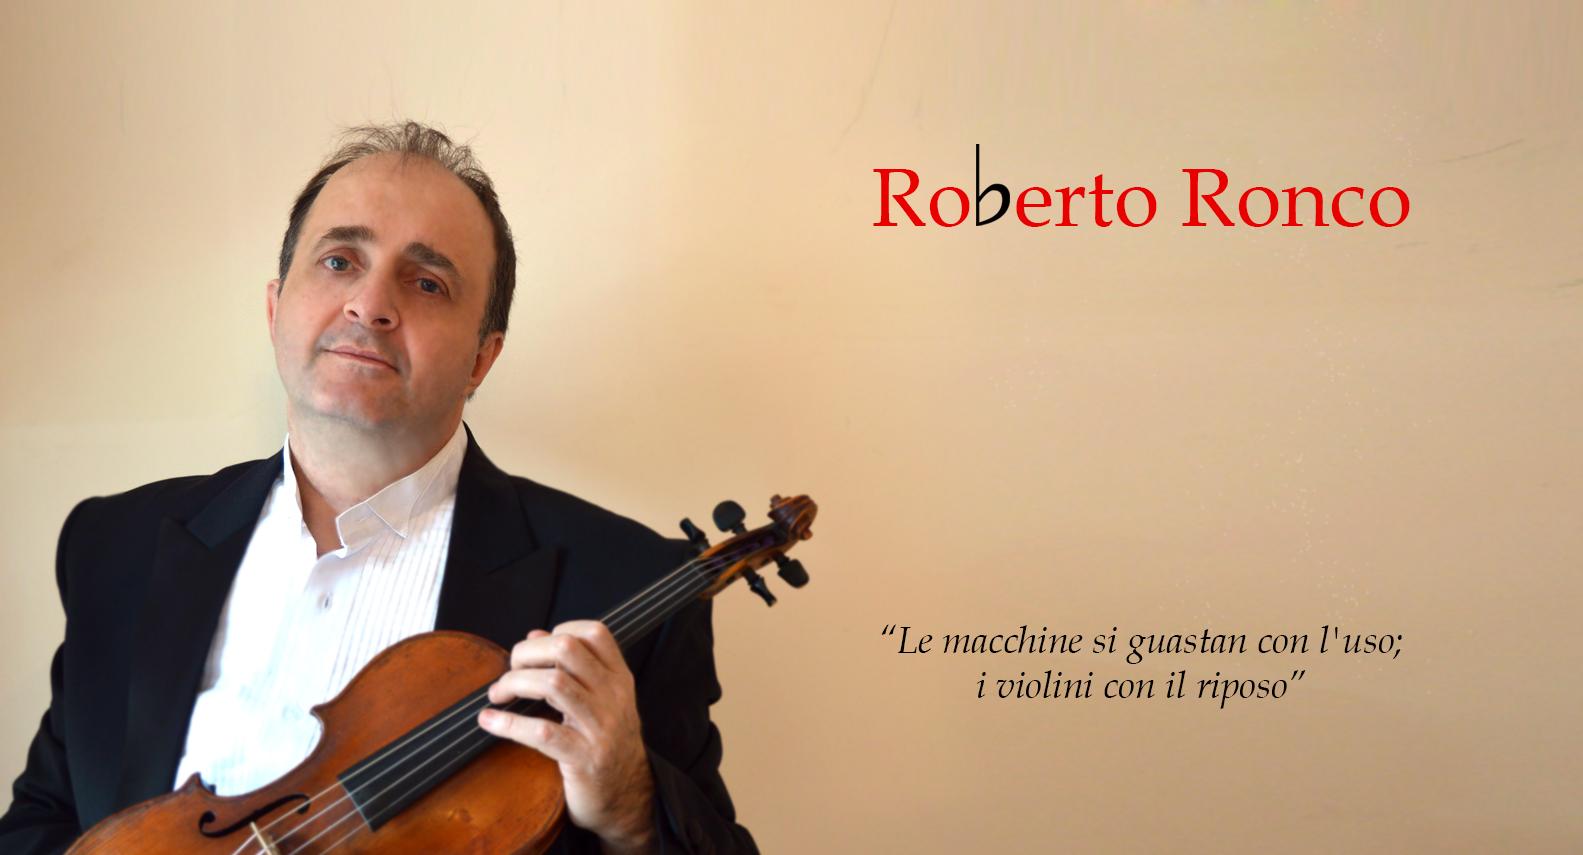 roberto-ronco-slide